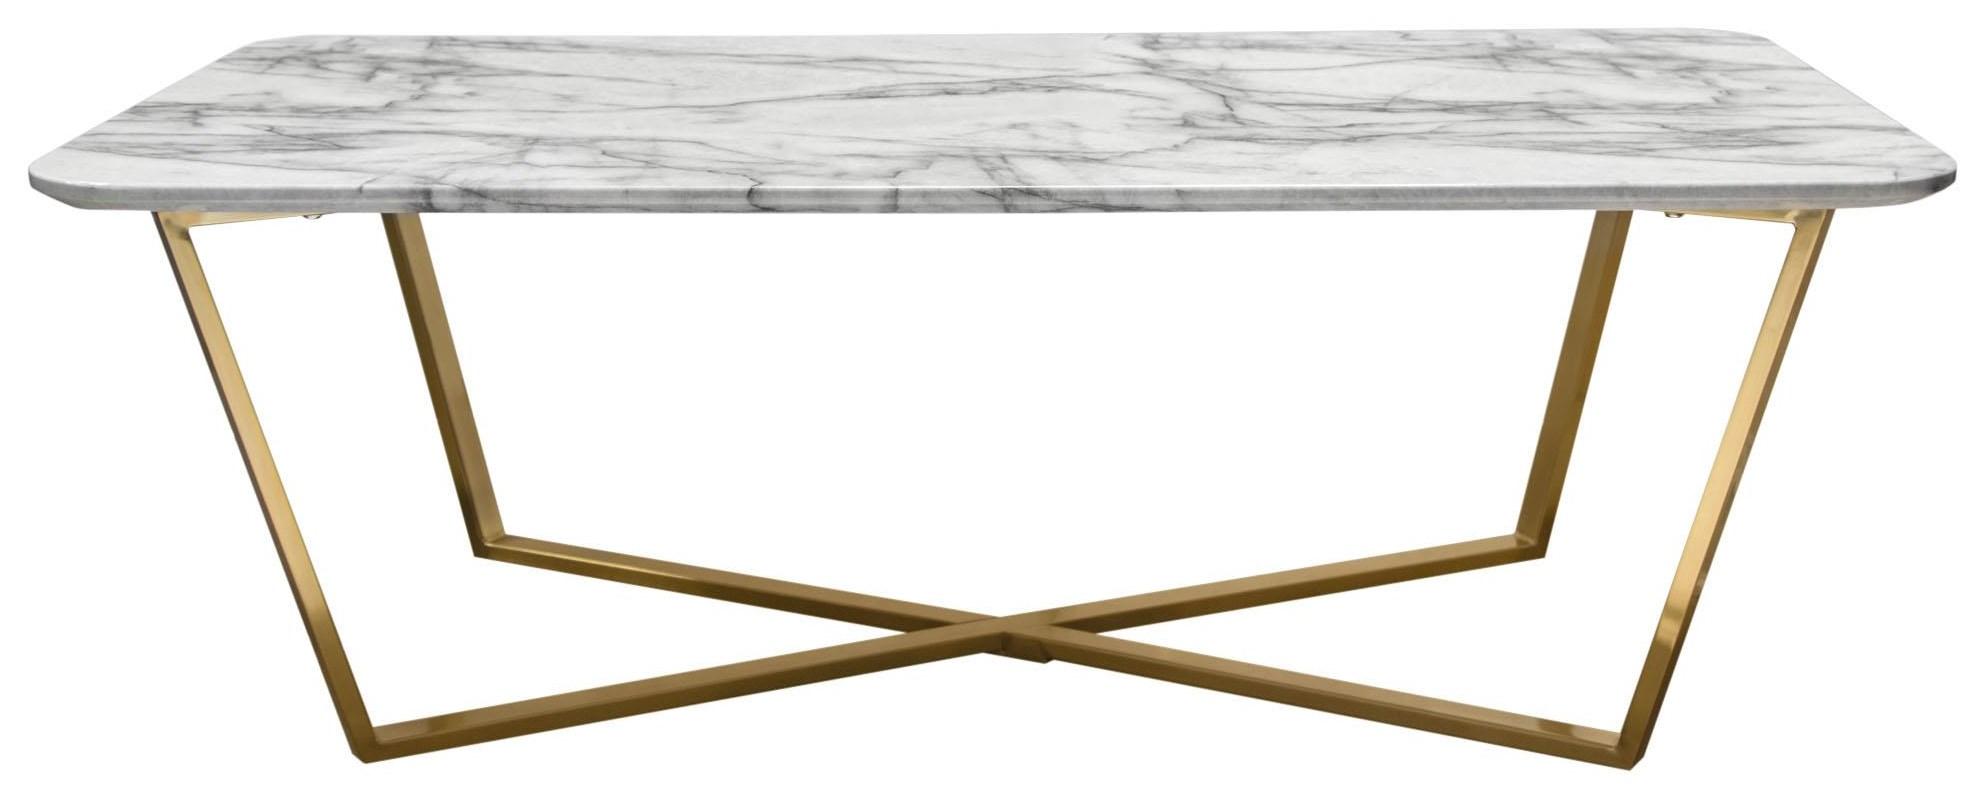 Vida Rectangular Cocktail Table by Diamond Sofa at Red Knot